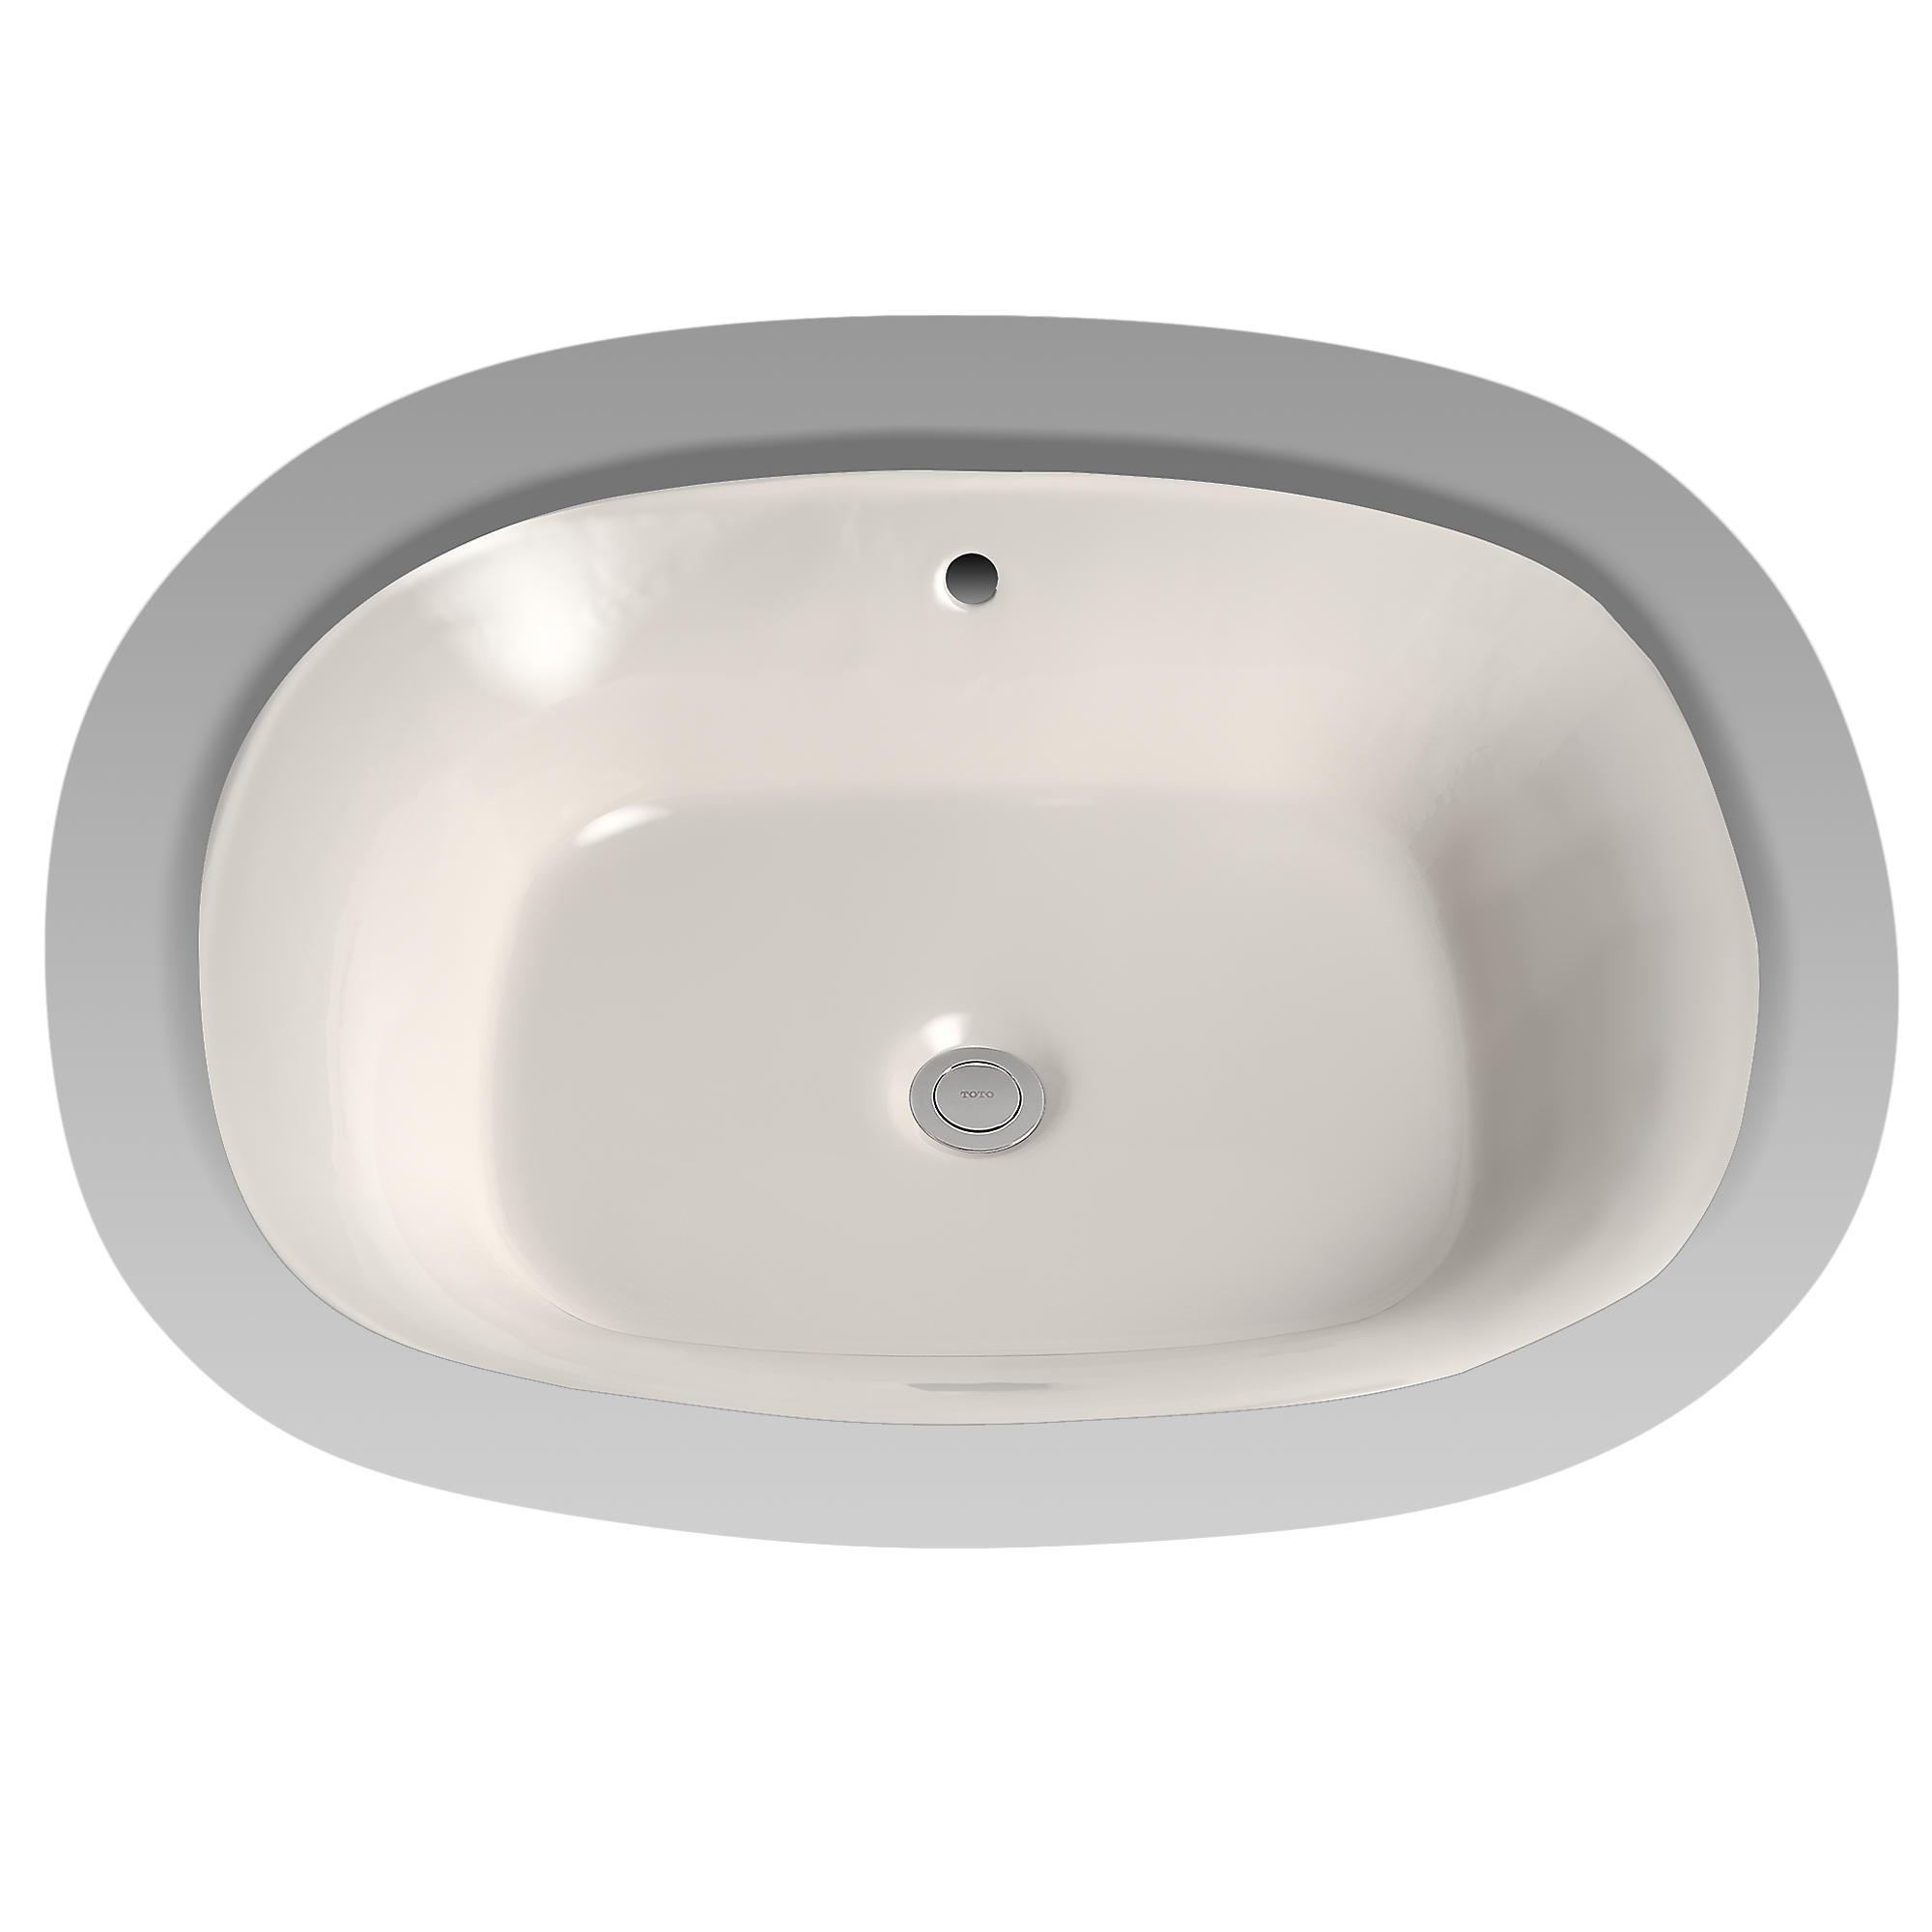 Lt481g 12 maris  undercounter lavatory 0